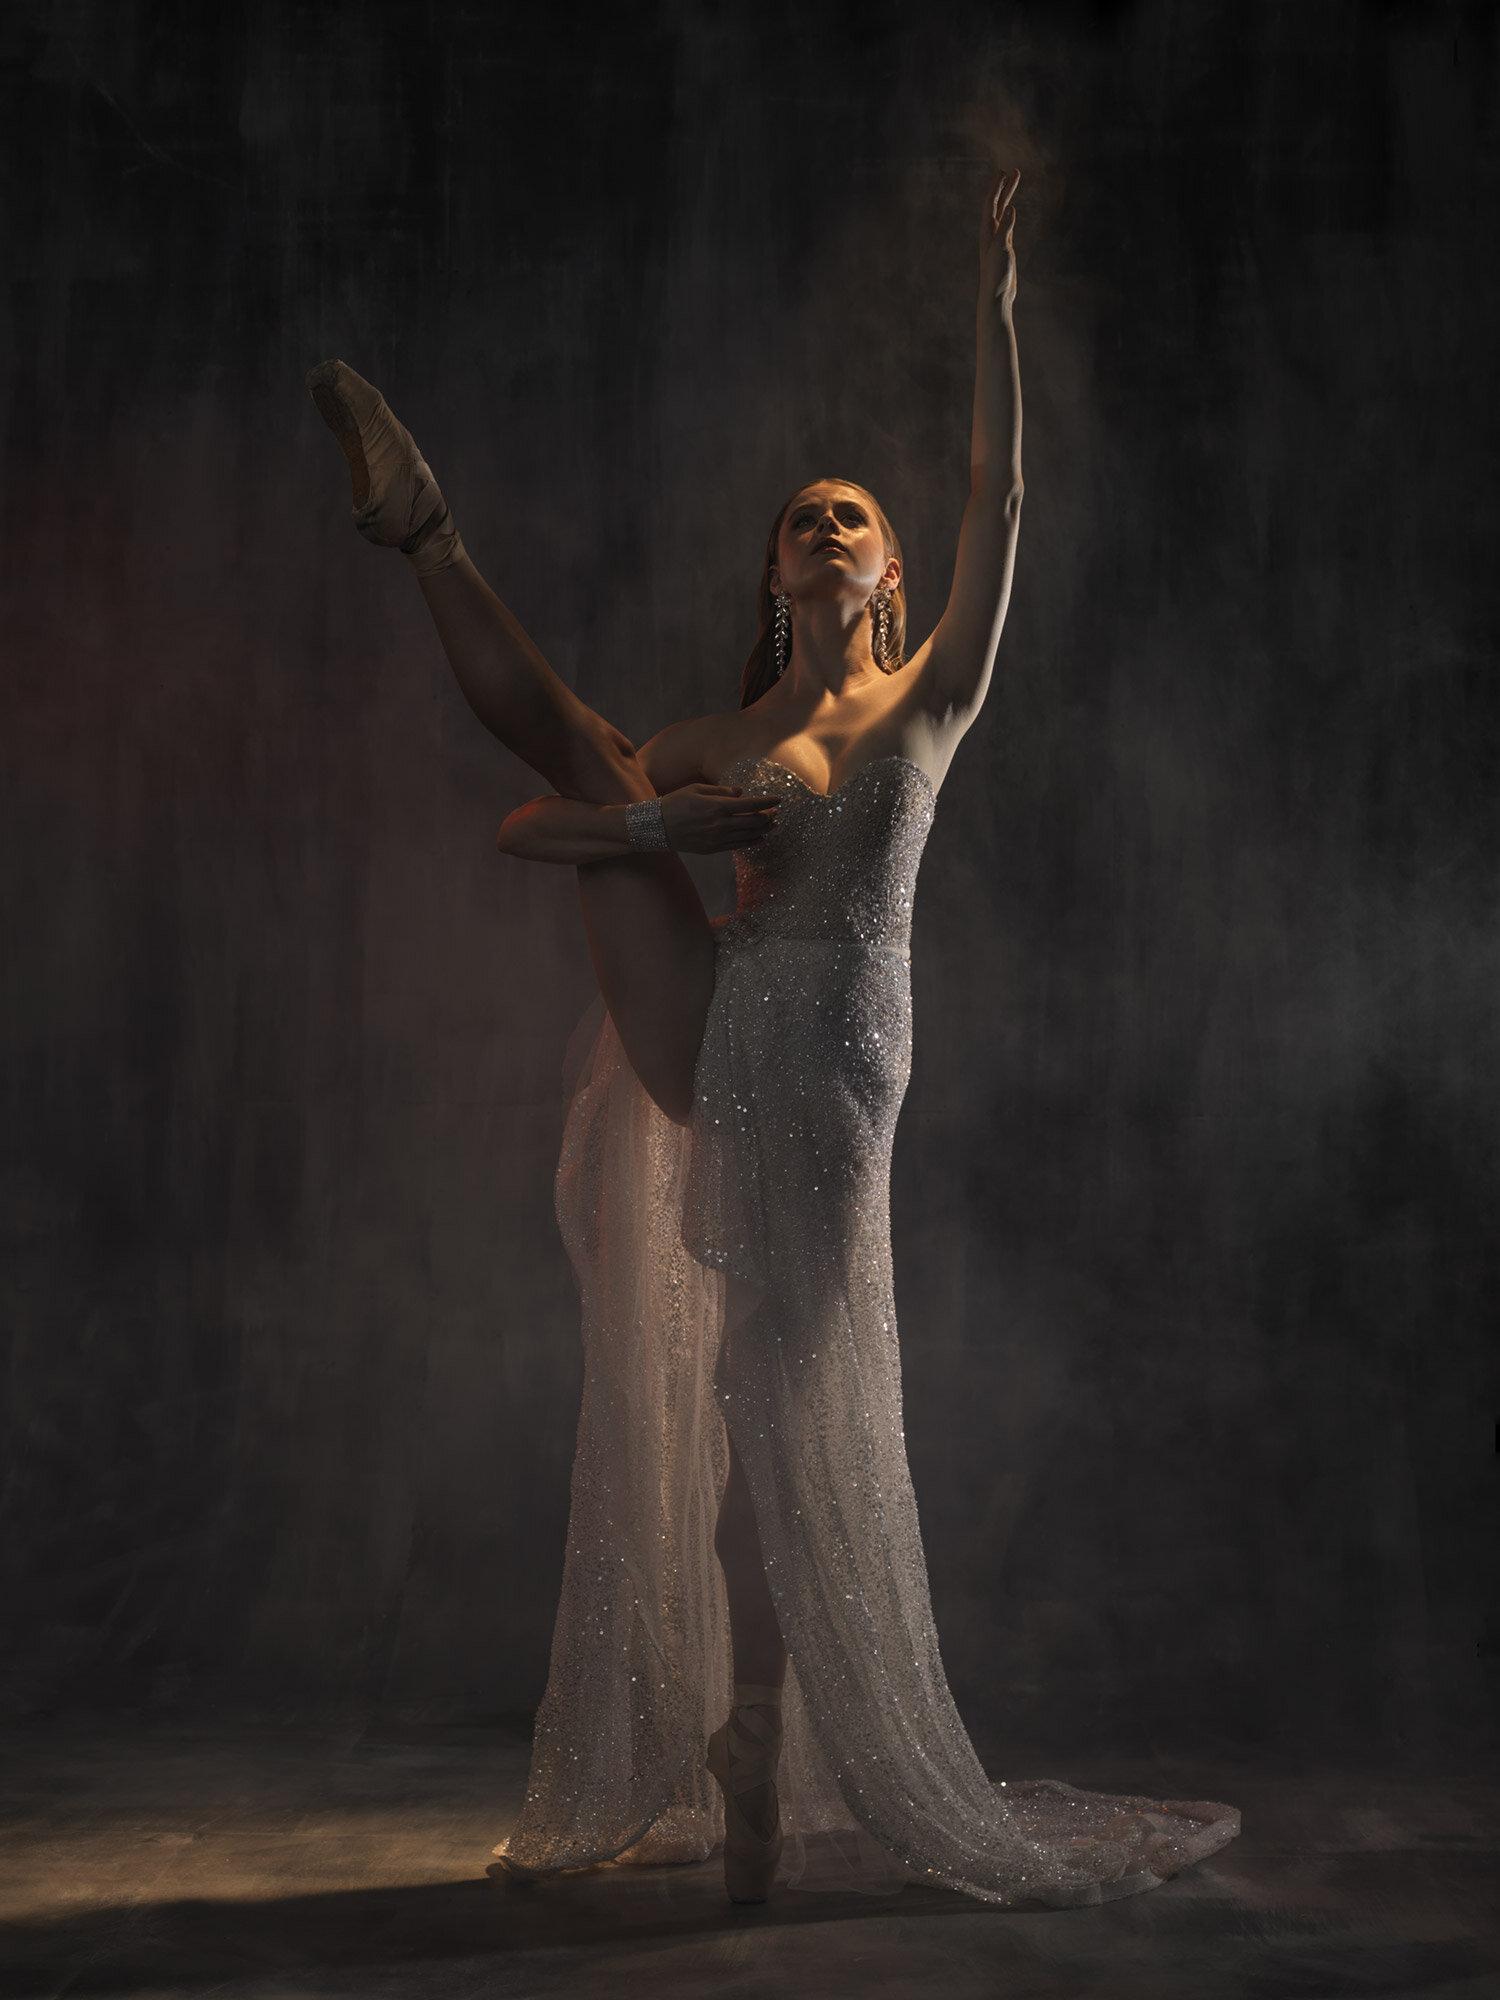 Tessa Puttick. 2019